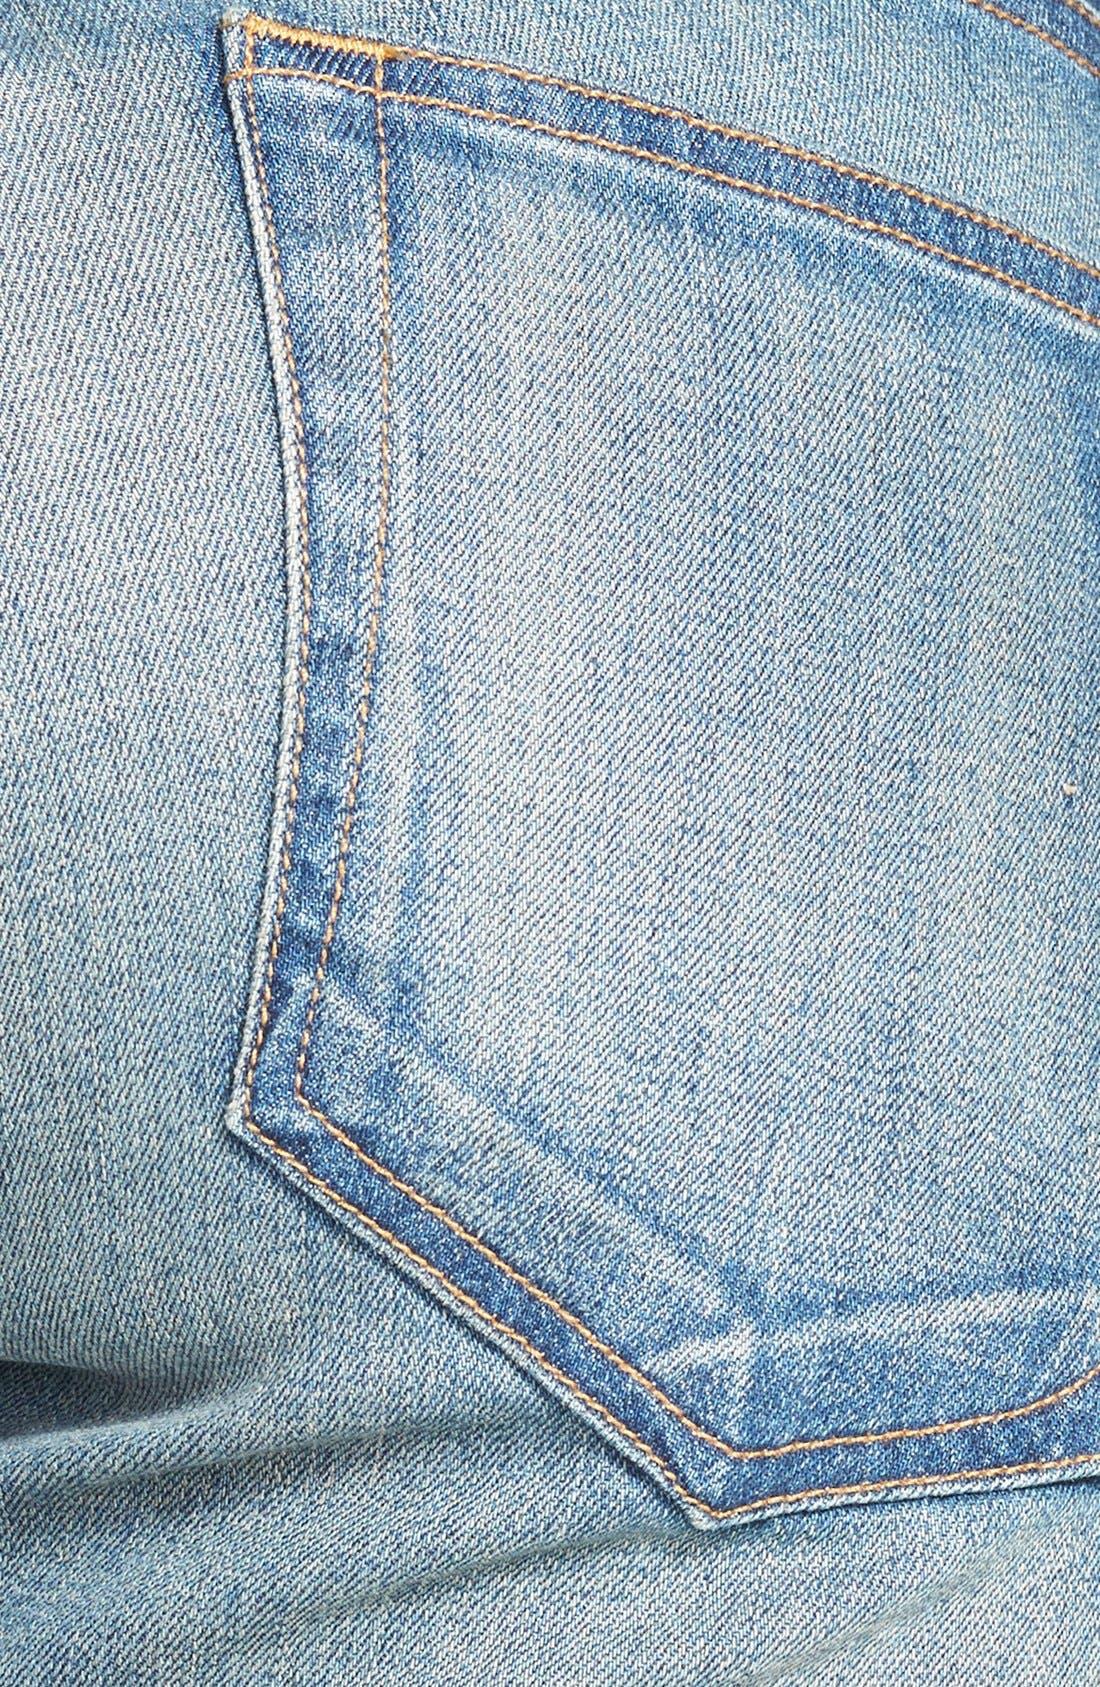 Alternate Image 3  - rag & bone/JEAN 'The Dre' Slim Fit Boyfriend Jeans (Golden) (Nordstrom Exclusive)